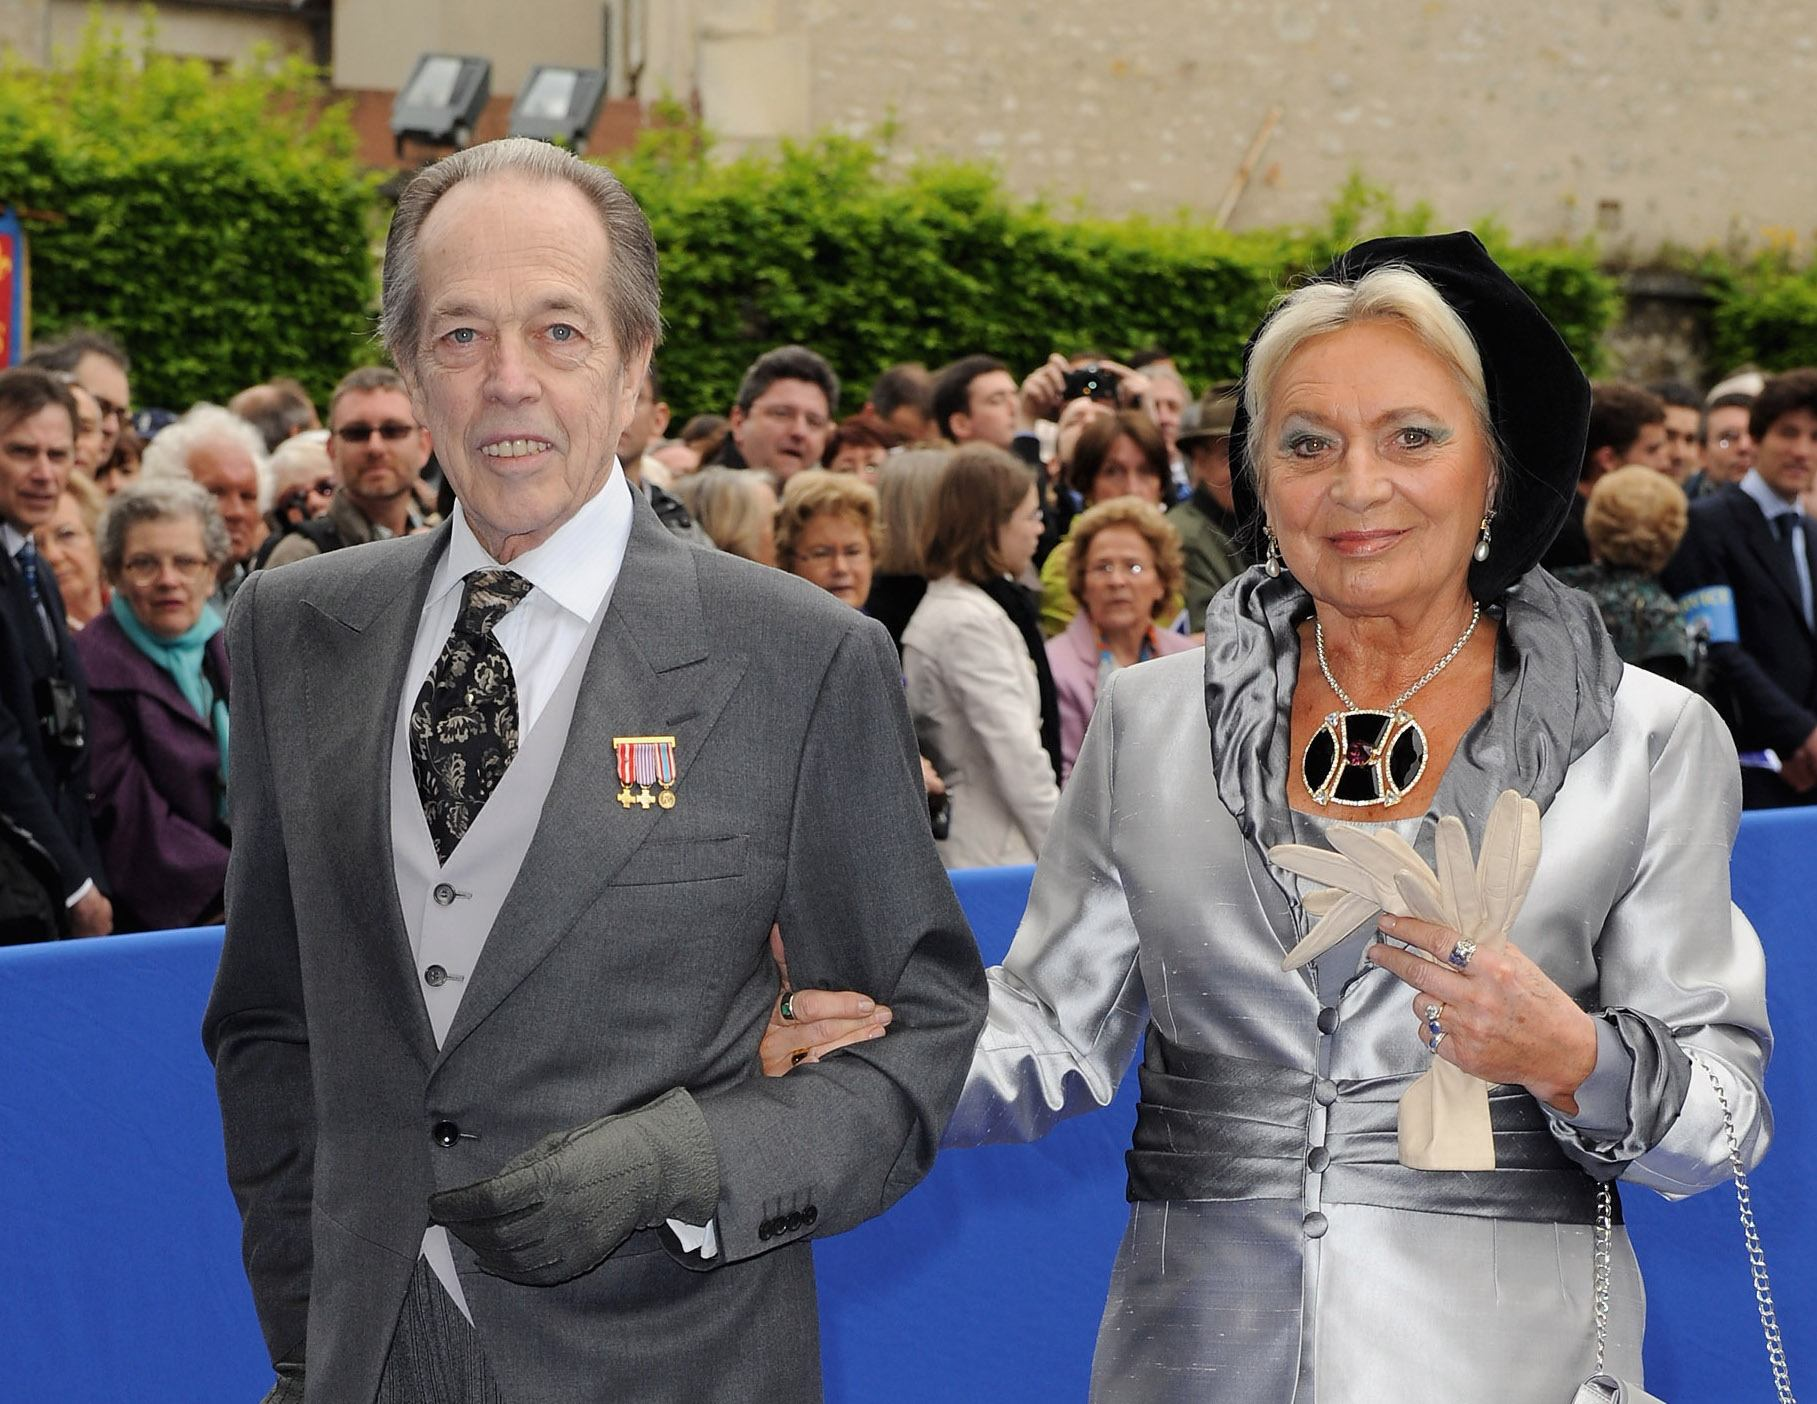 Prince Henri D'Orleans, Duc de Vendome and Philomena de Tornos Celebrate Wedding in Senlis